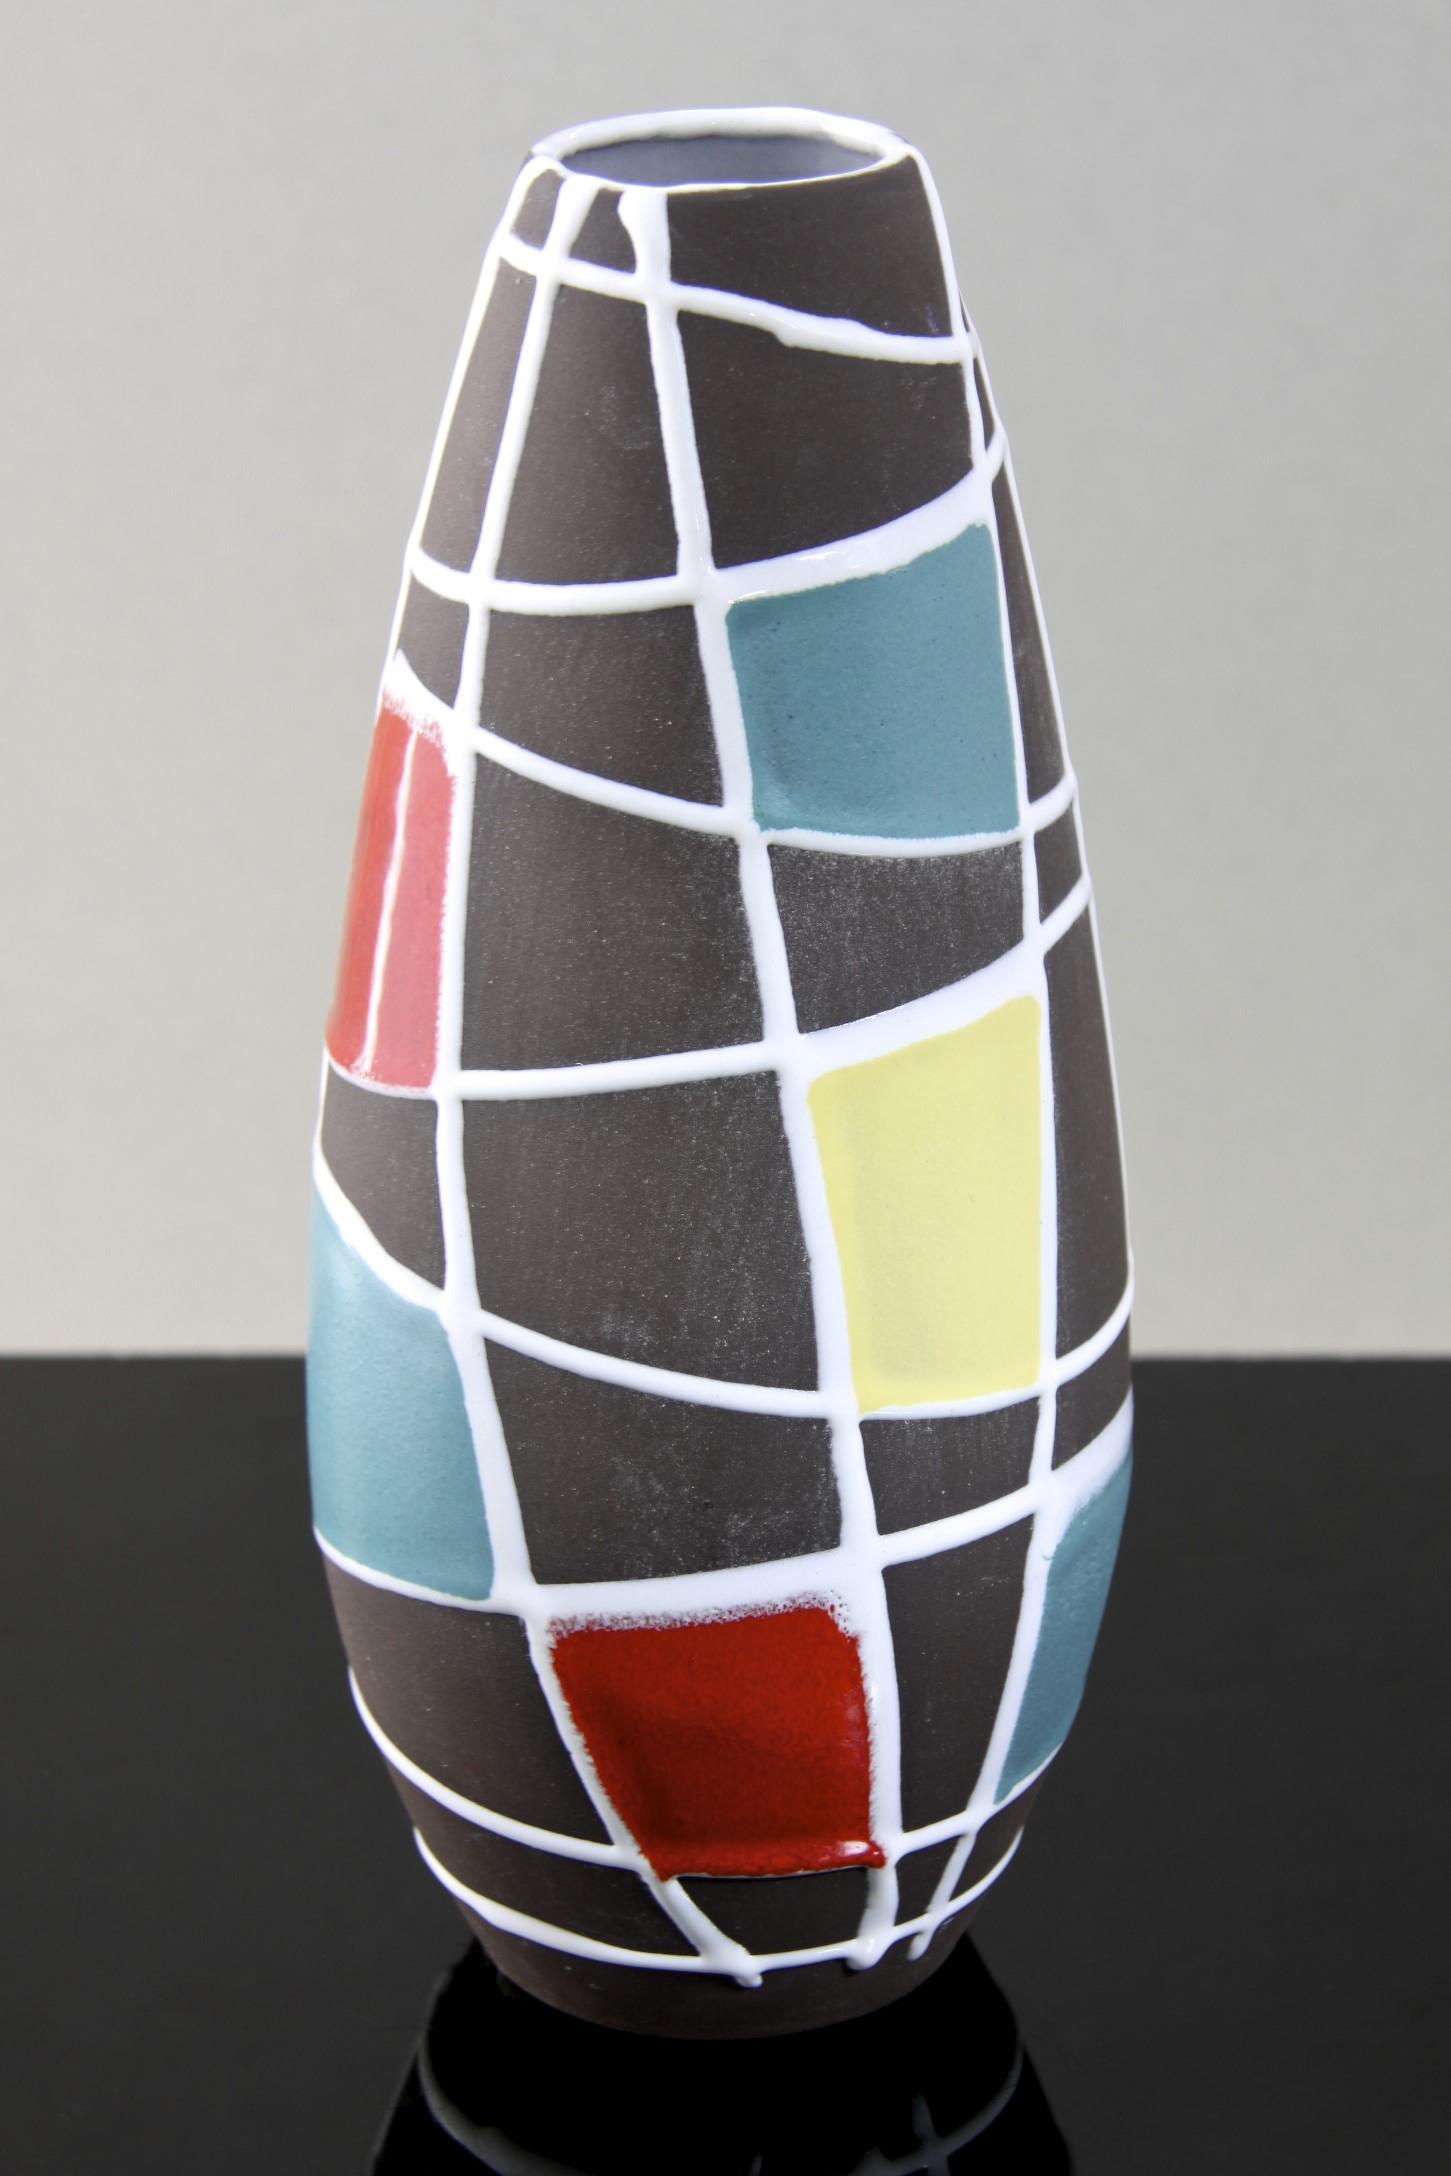 schlossberg keramik kuba vase designed by liesel spornhauer west germany 1958 afterglow retro. Black Bedroom Furniture Sets. Home Design Ideas